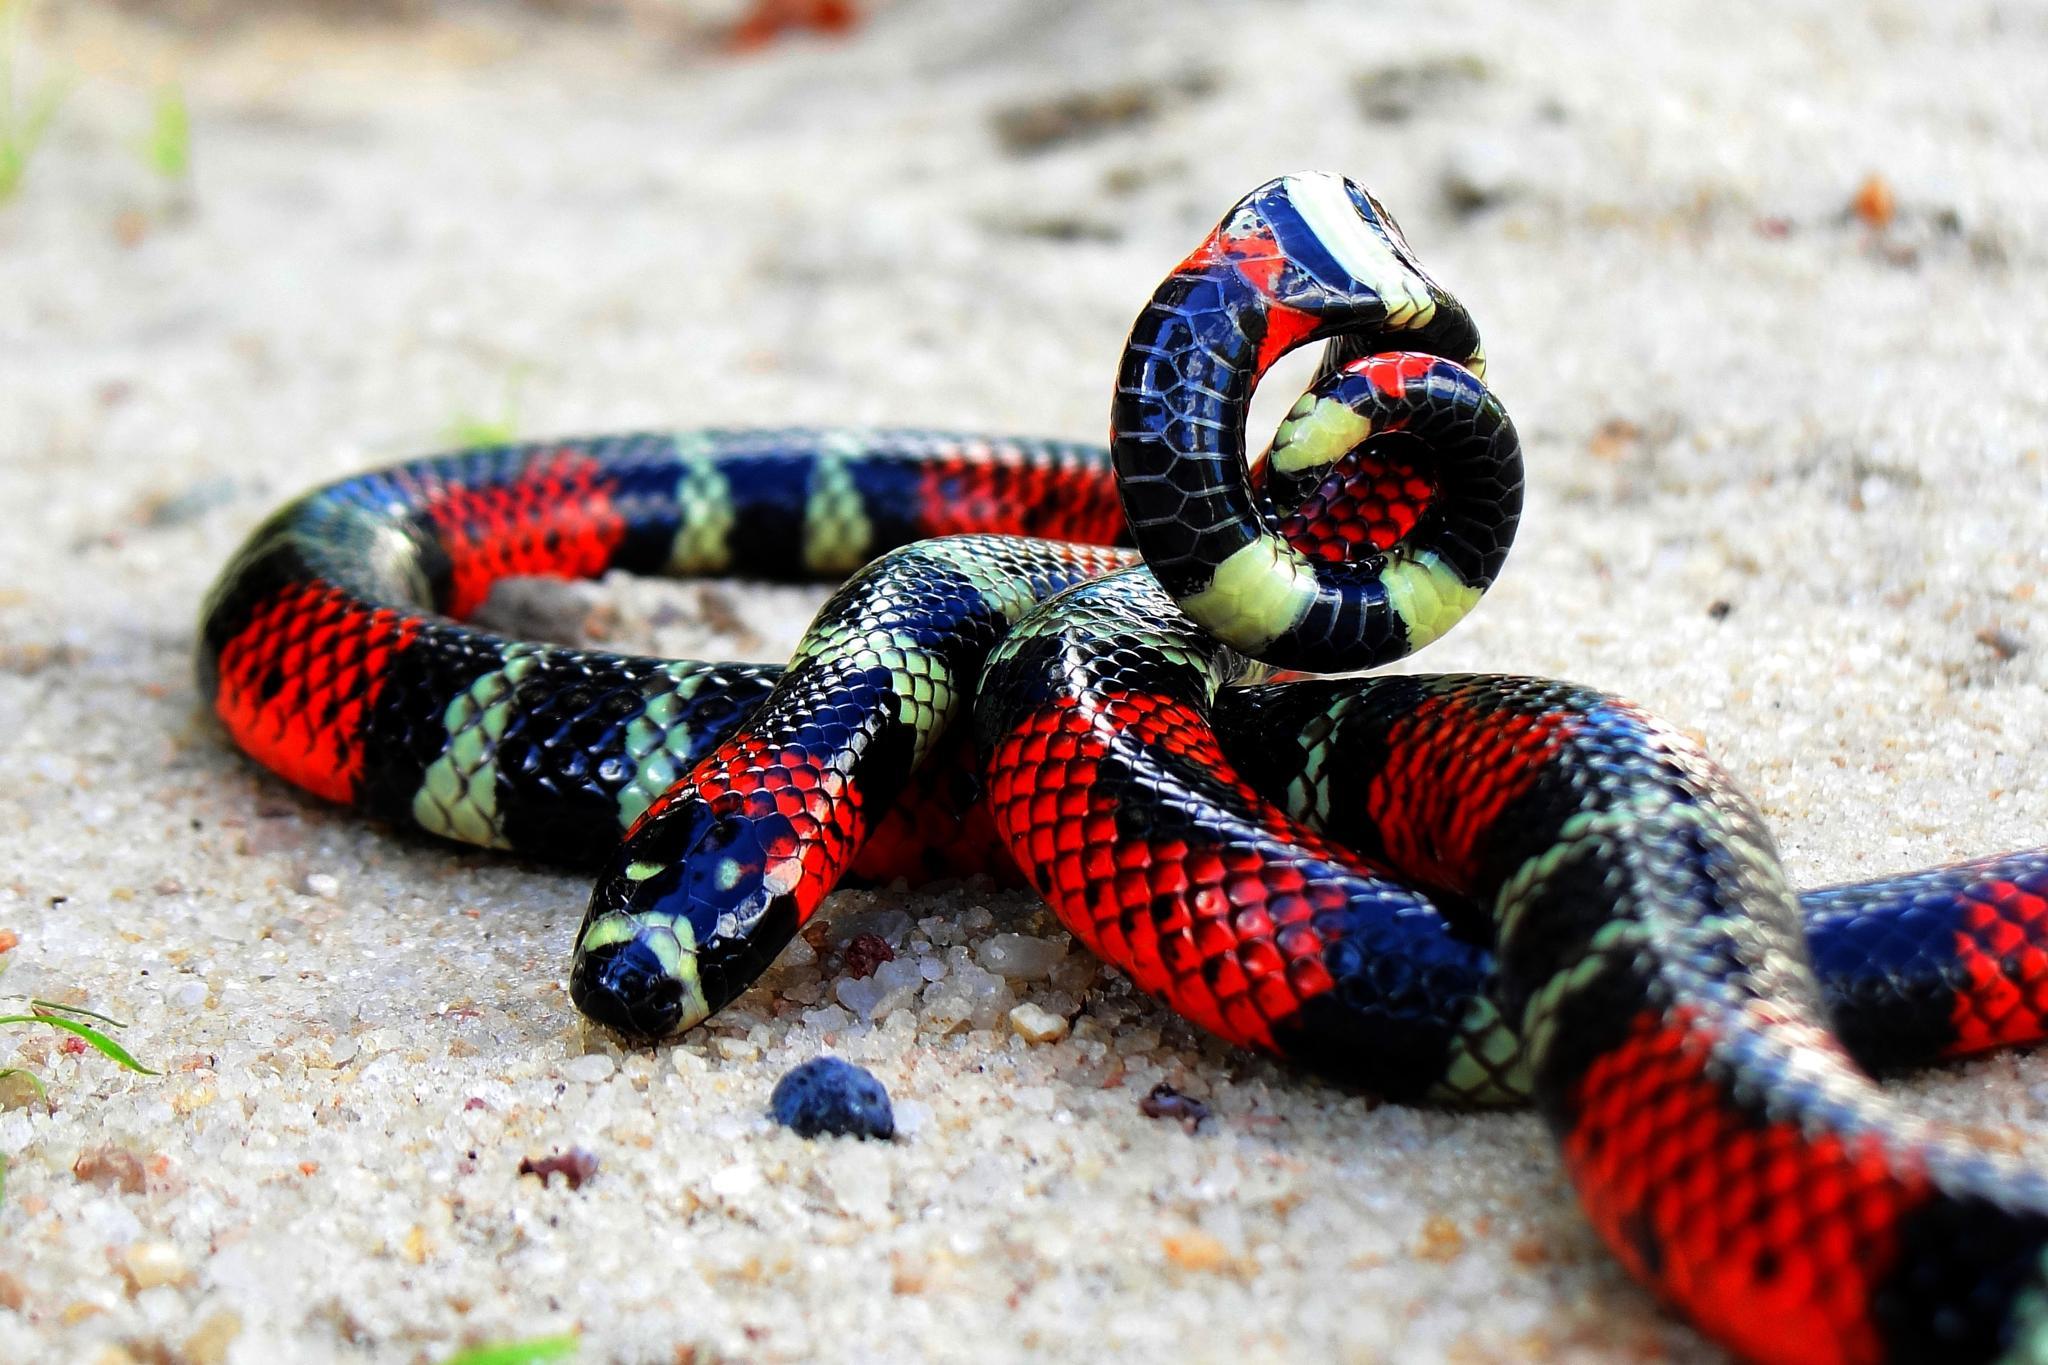 Brazilian Coral Snake (Micrurus potyguara) by Willianilson Pessoa